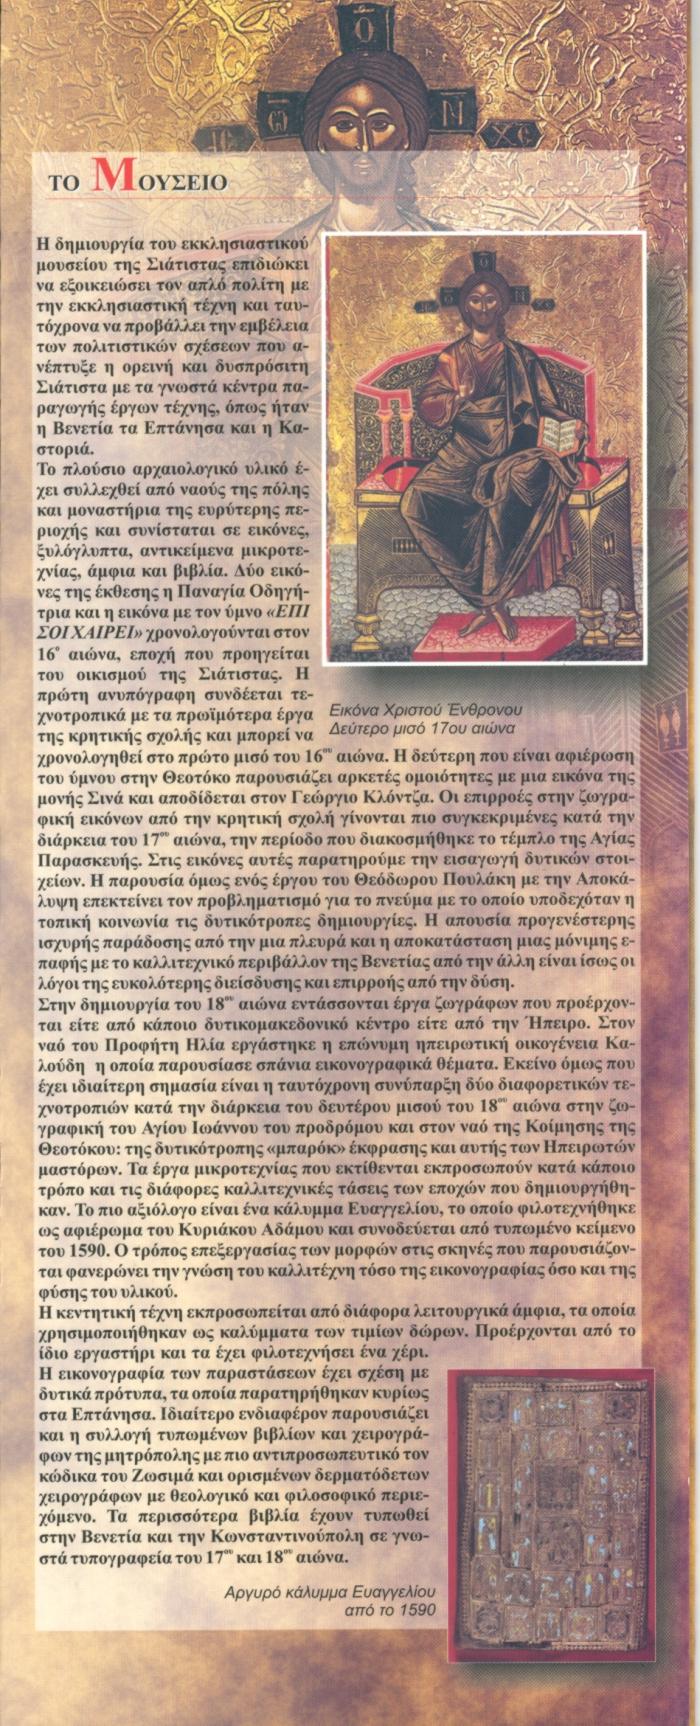 https://www.siatistanews.gr/1203/ekklisiastiko/1203ems2a.JPG